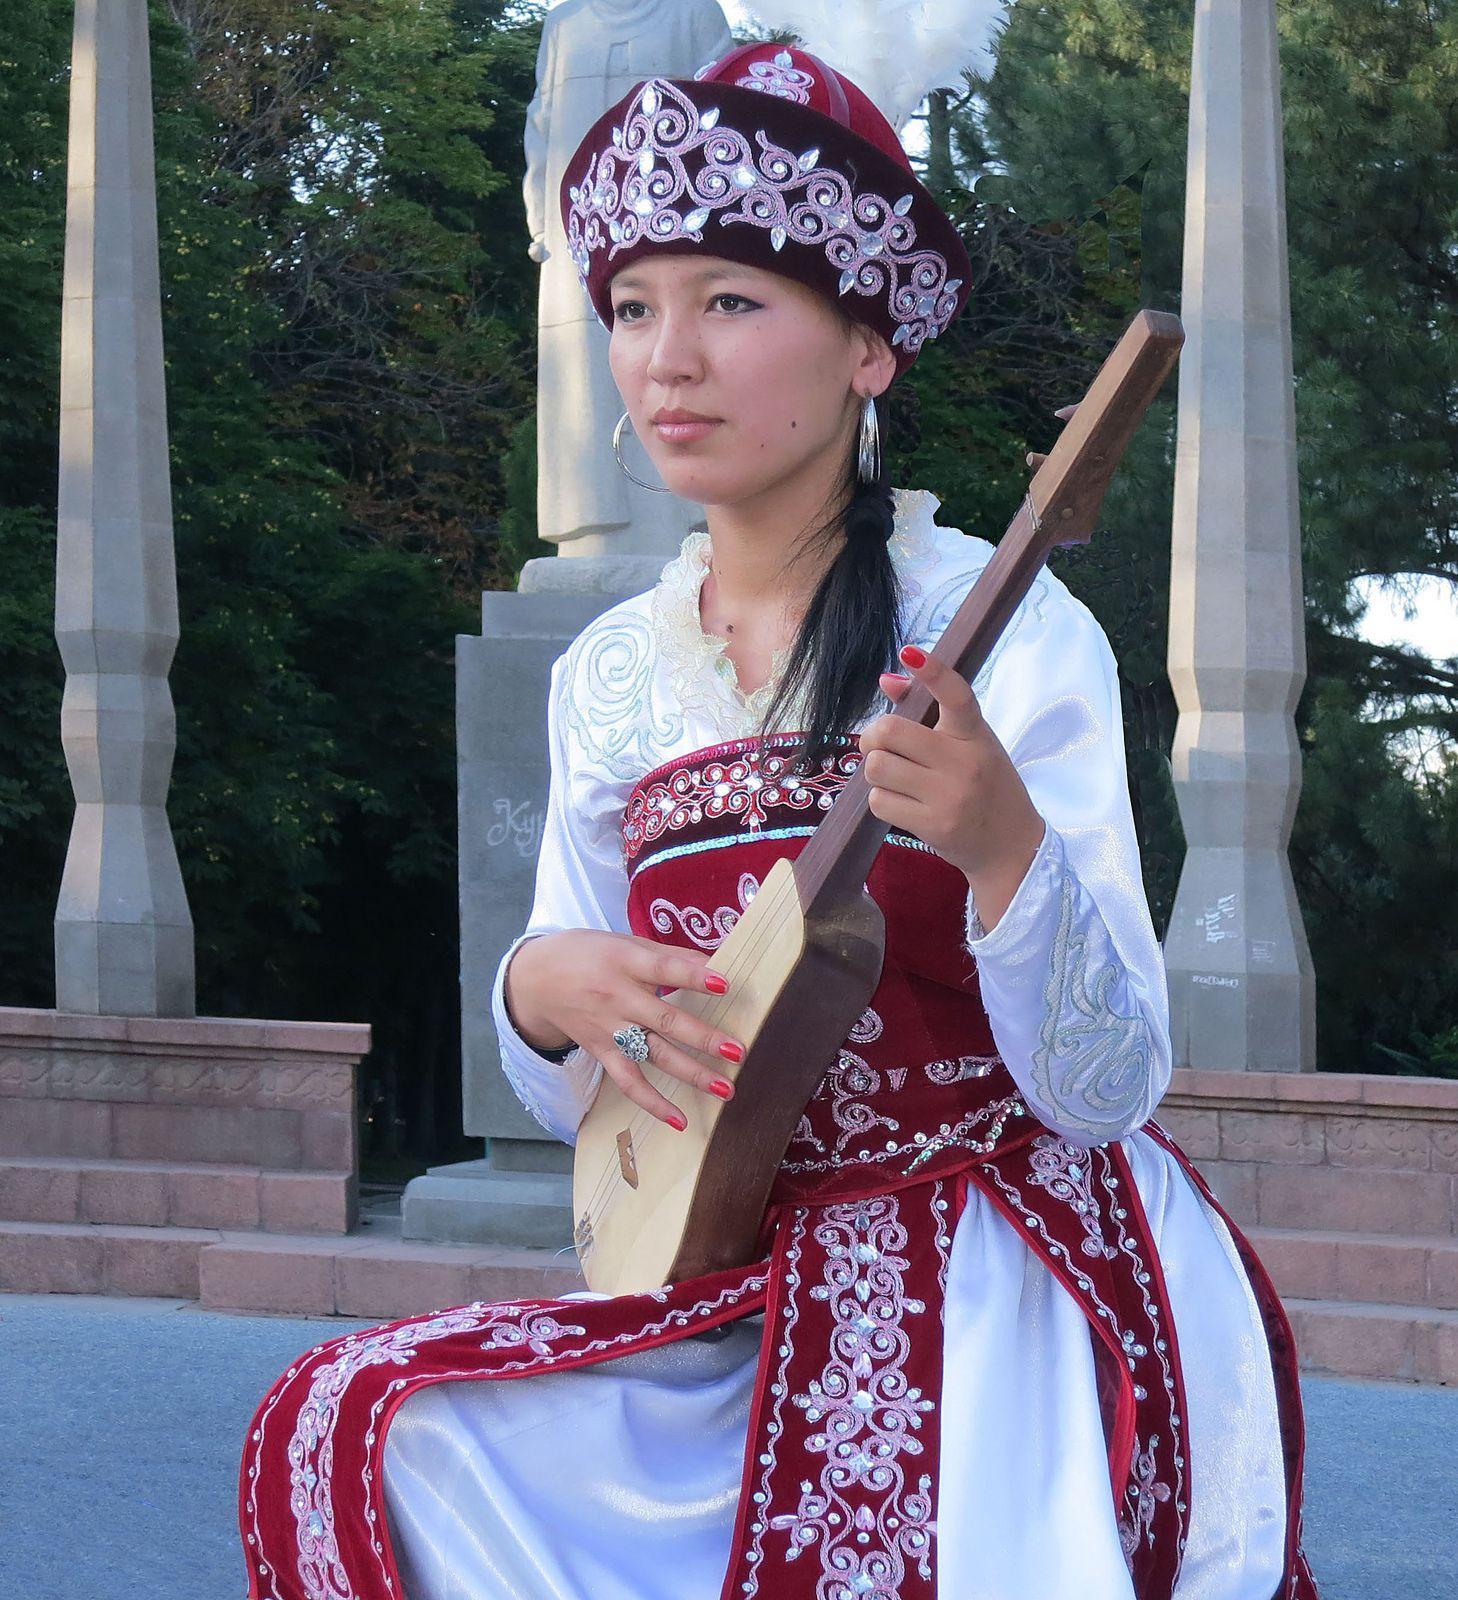 Kyrgyzstan woman. 🏷️ Kyrgyzstan women. 2019-12-17